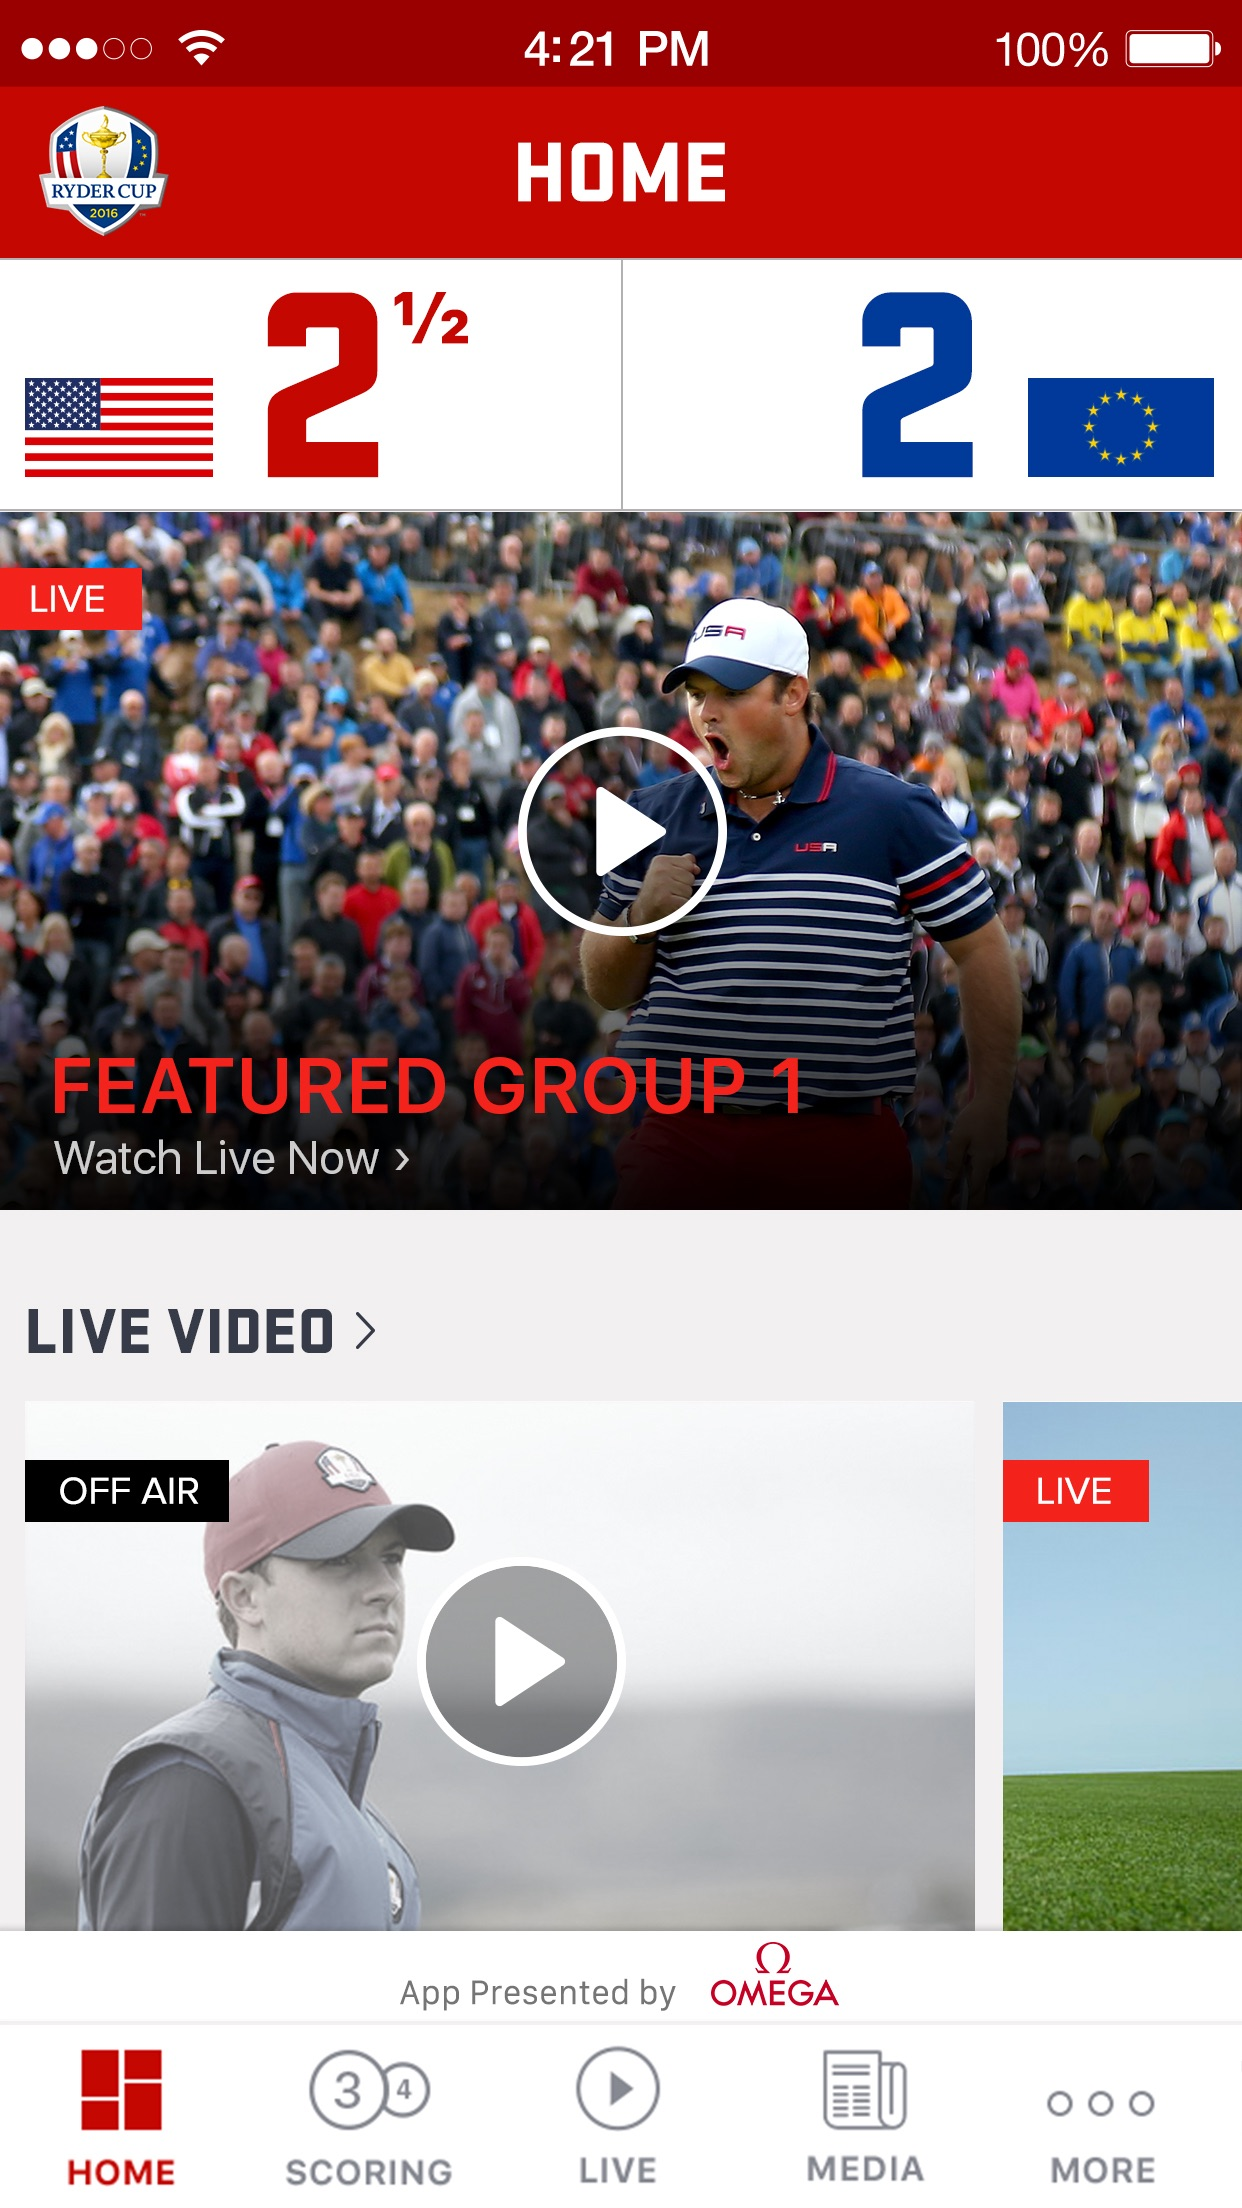 Ryder Cup 2016 – Hazeltine National Golf Club Screenshot